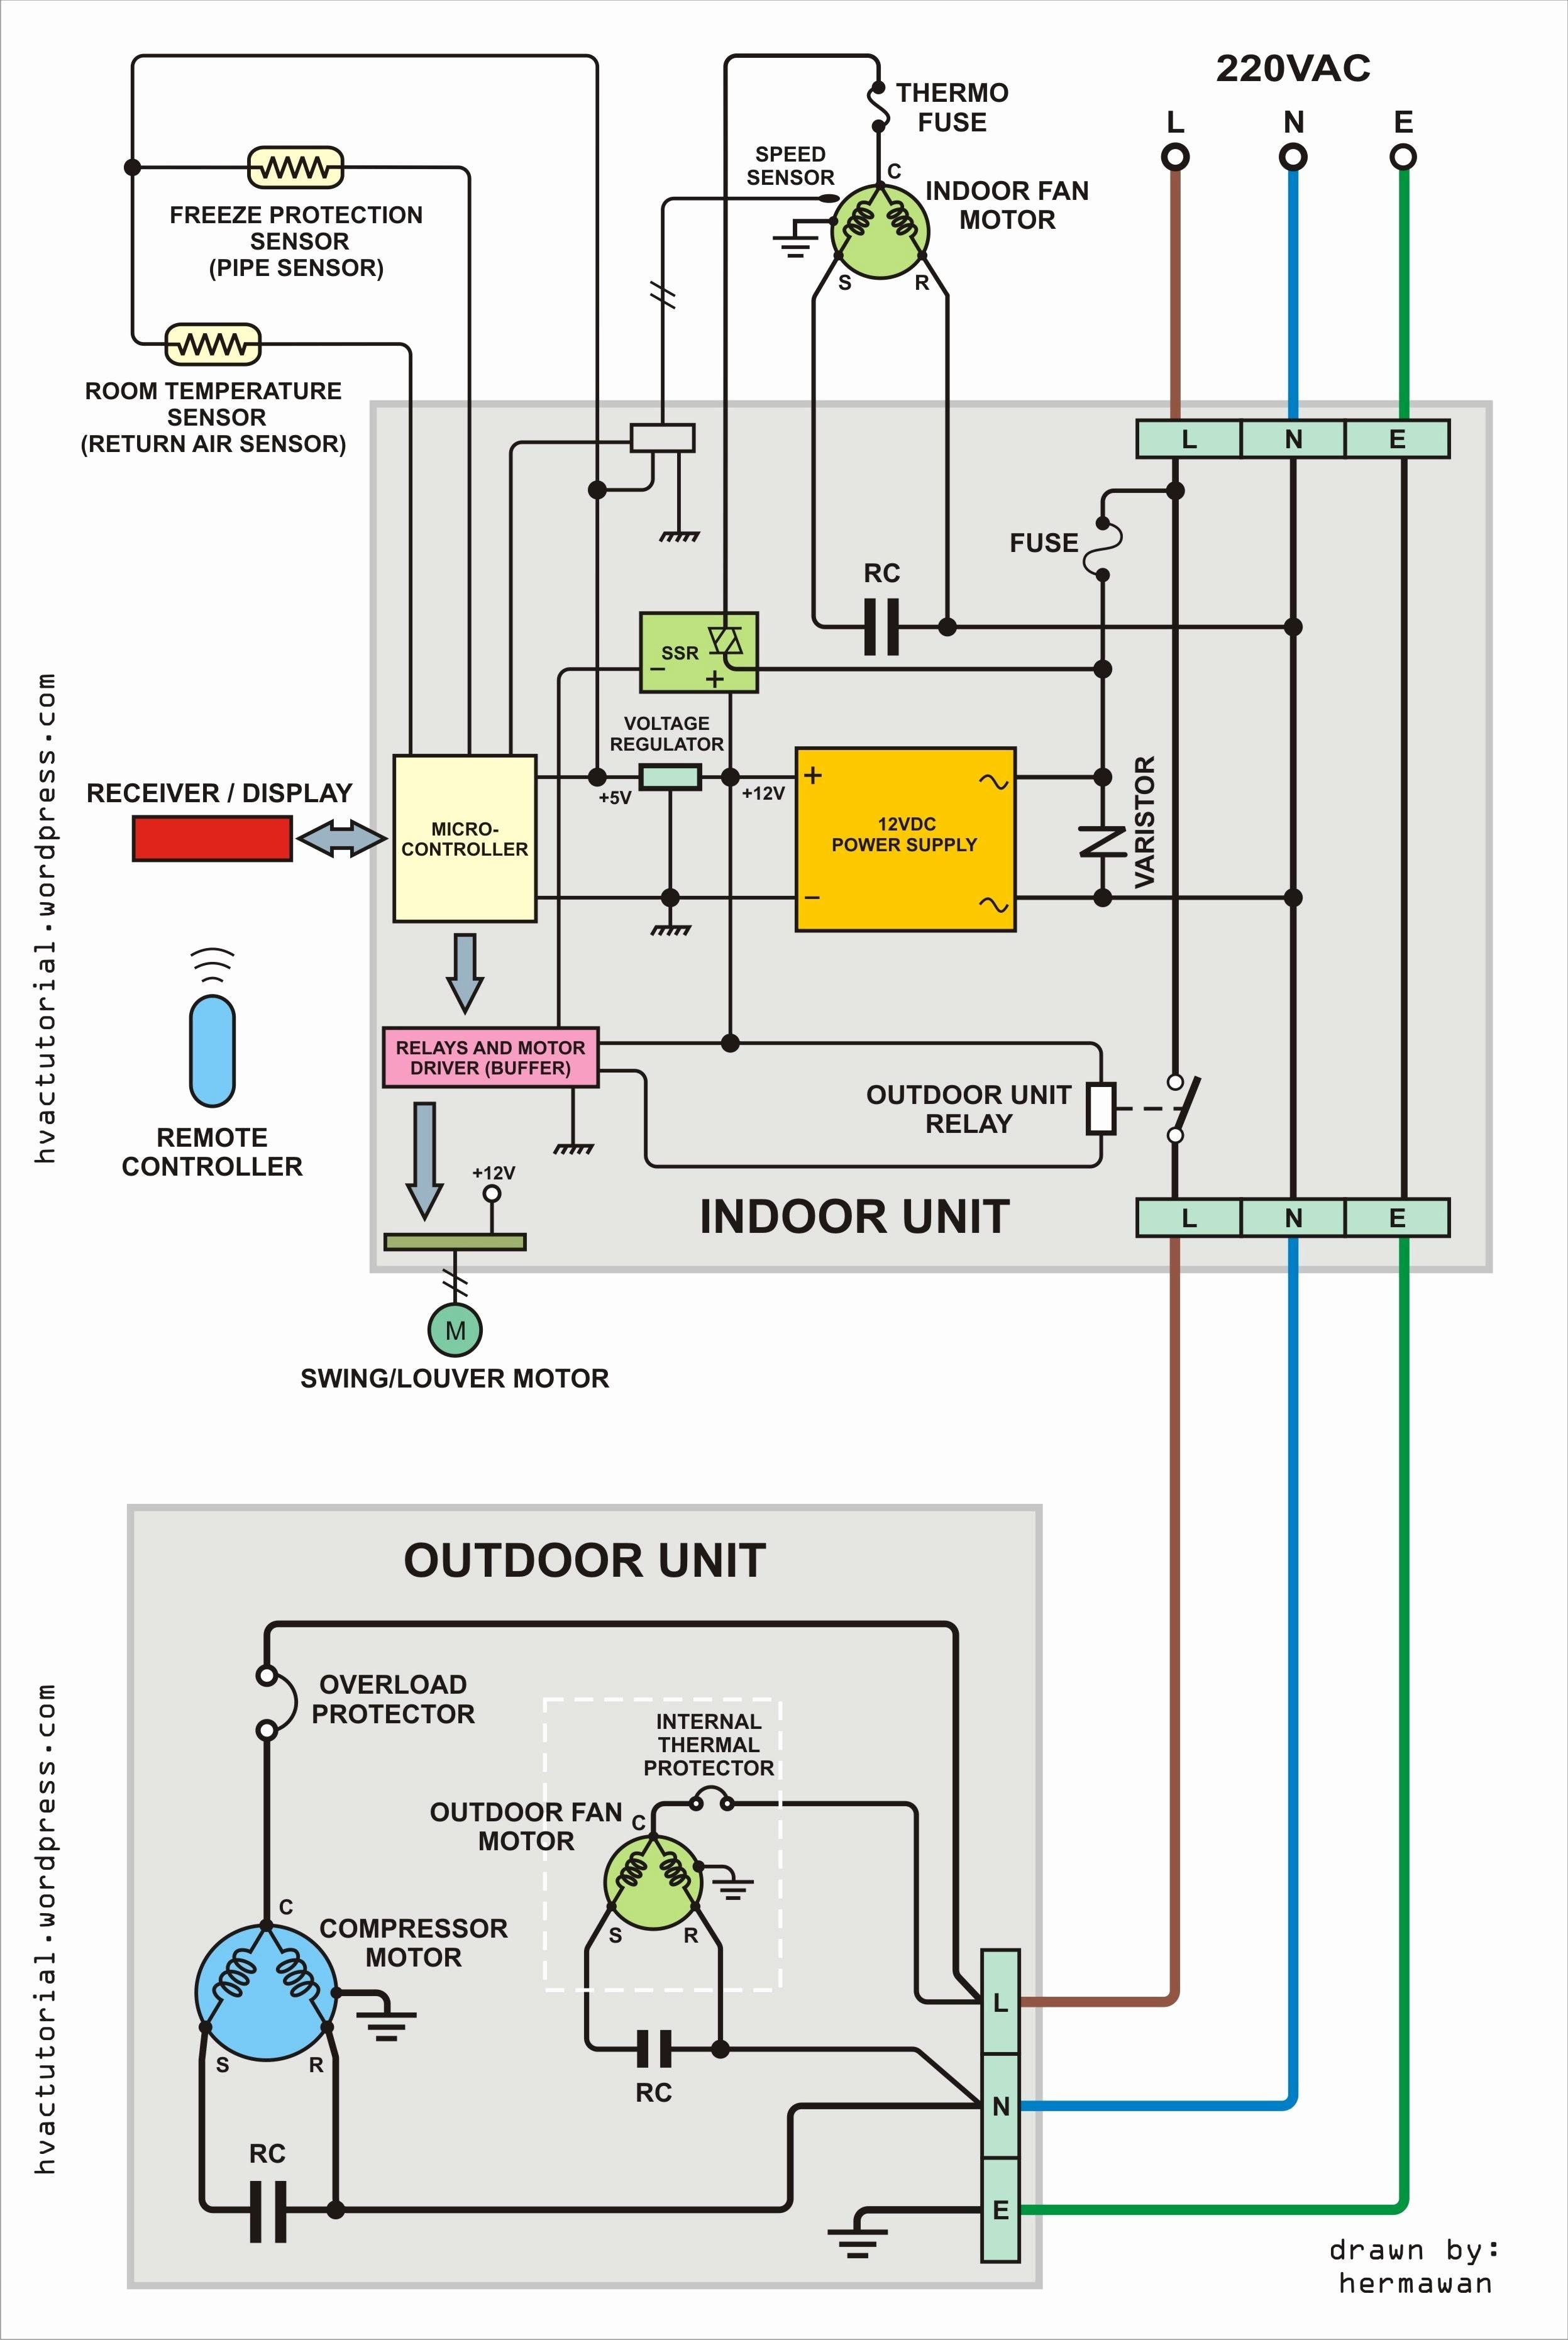 fujitsu mini split wiring diagram wiring library Samsung Mini Split Wiring Diagram fujitsu mini split wiring diagram